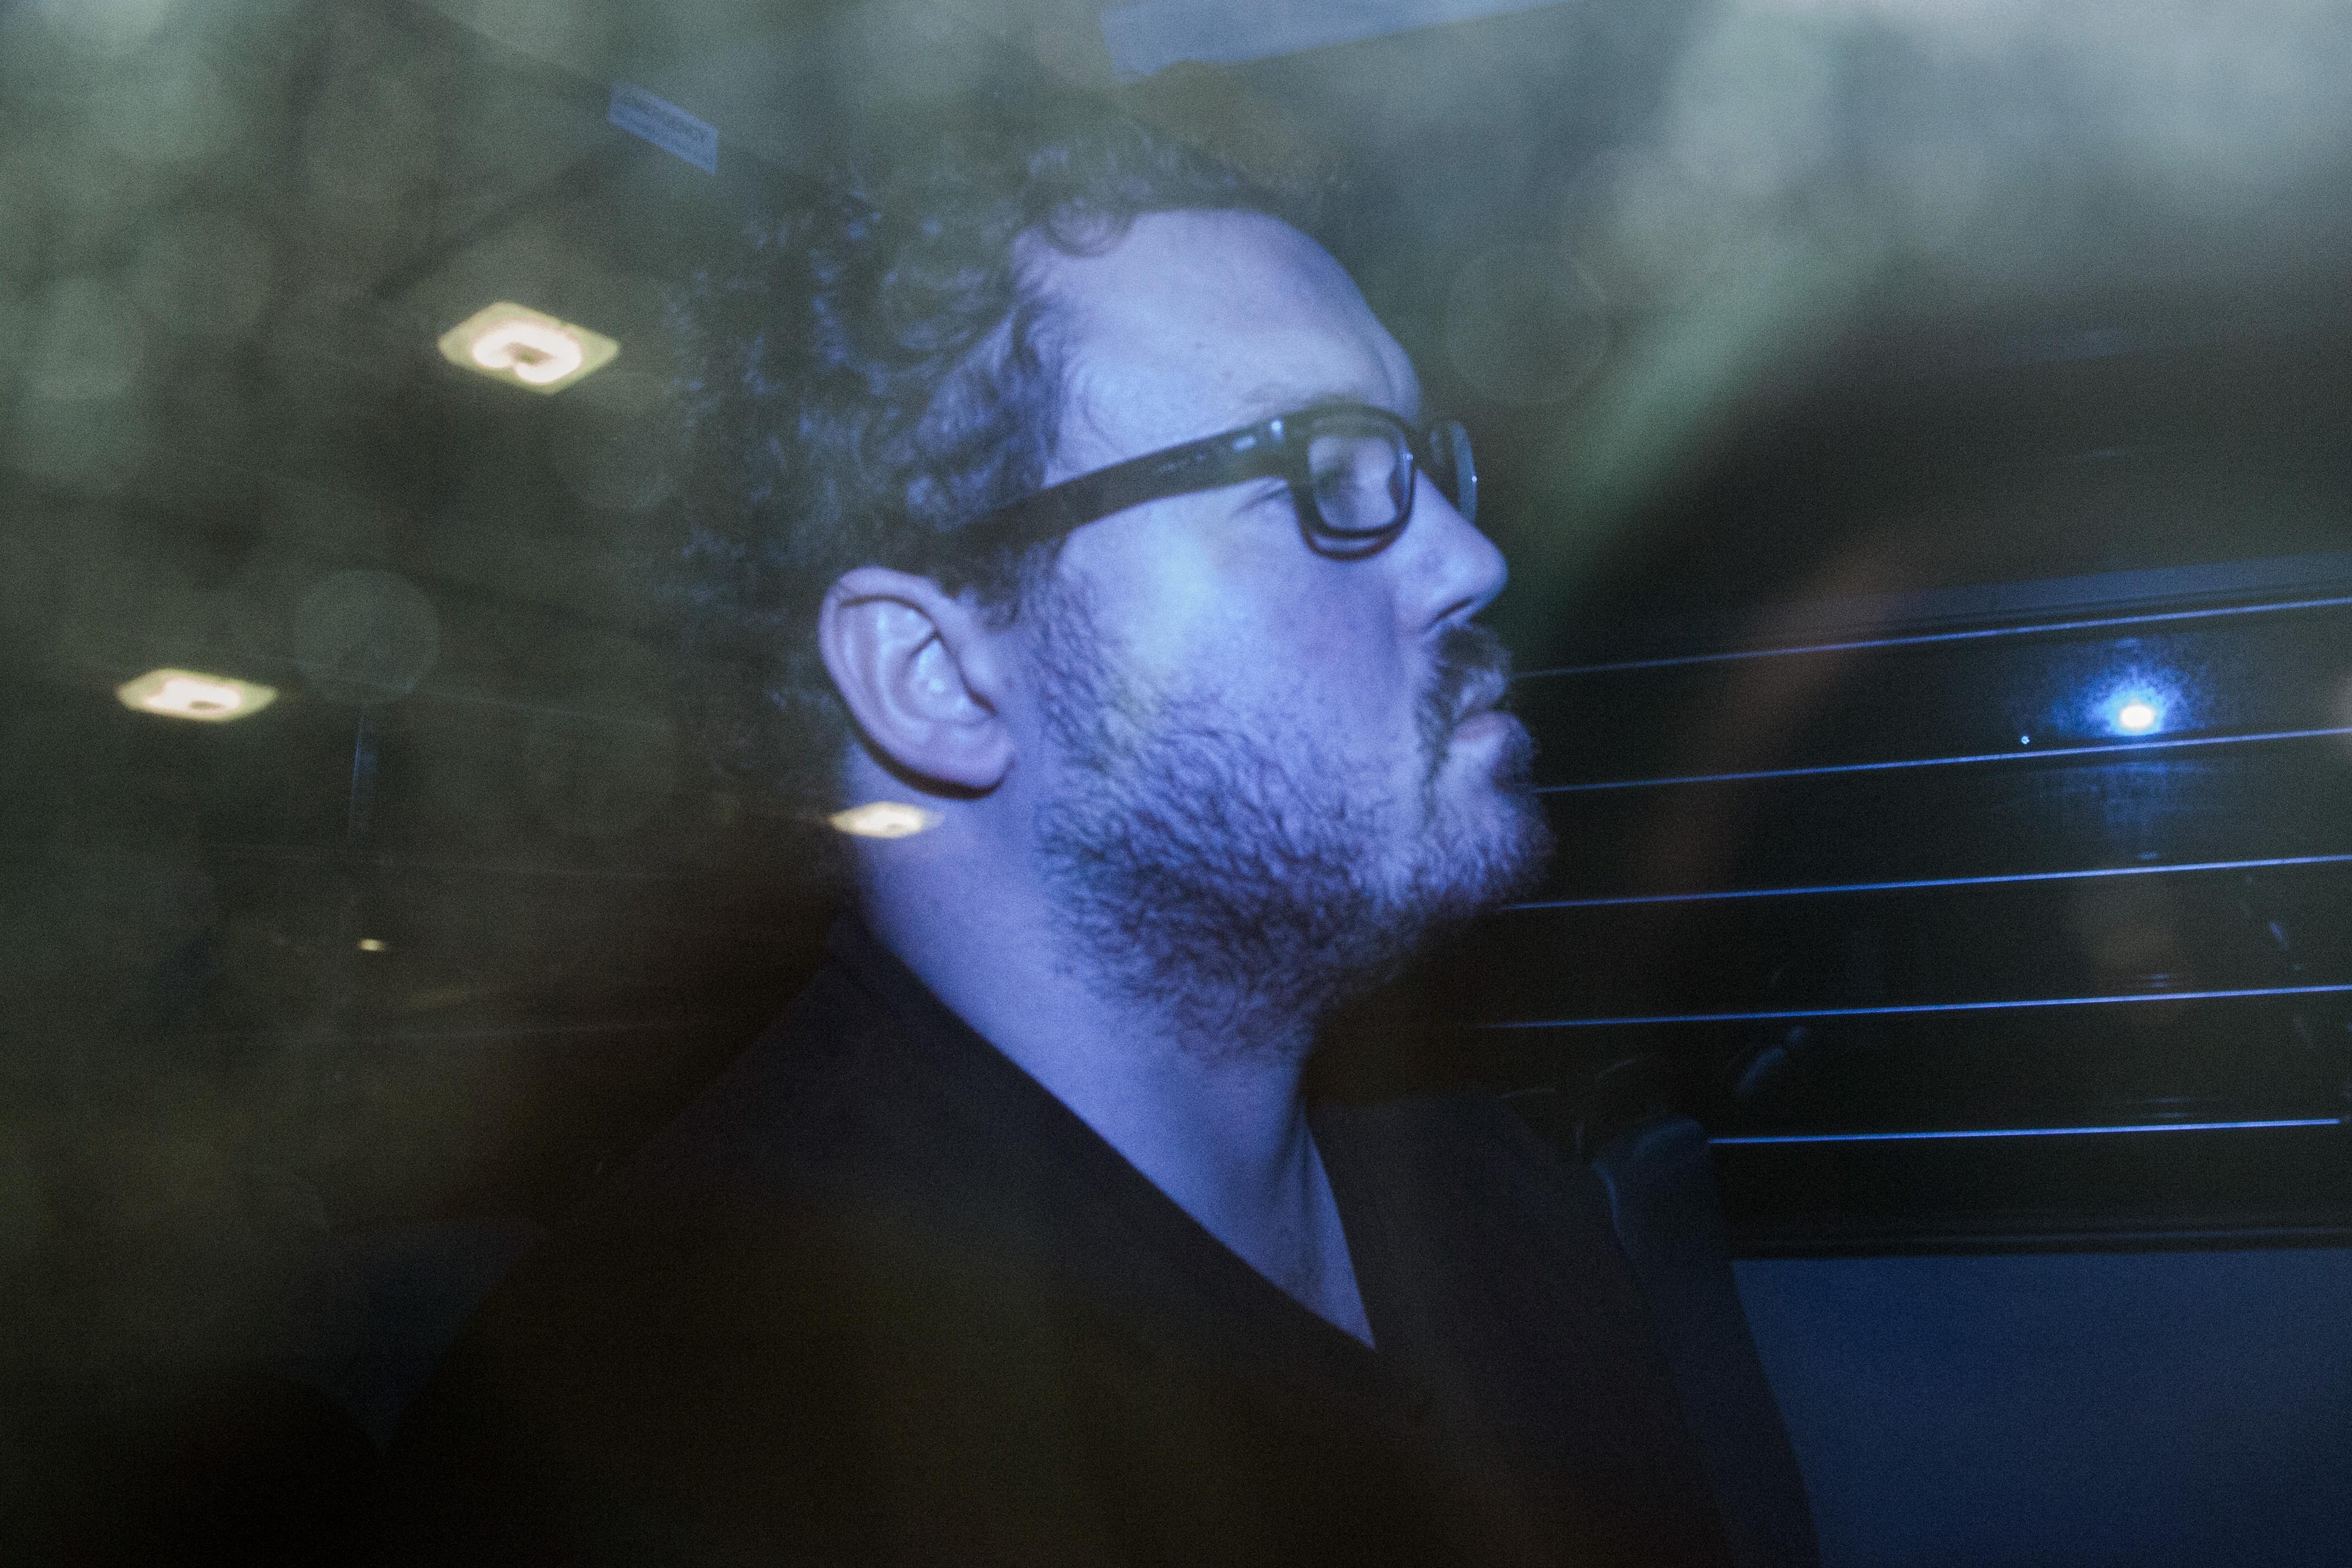 Rurik George Caton Jutting leaves the Eastern Magistrates' Court in a prison van in Hong Kong on Nov. 3, 2014